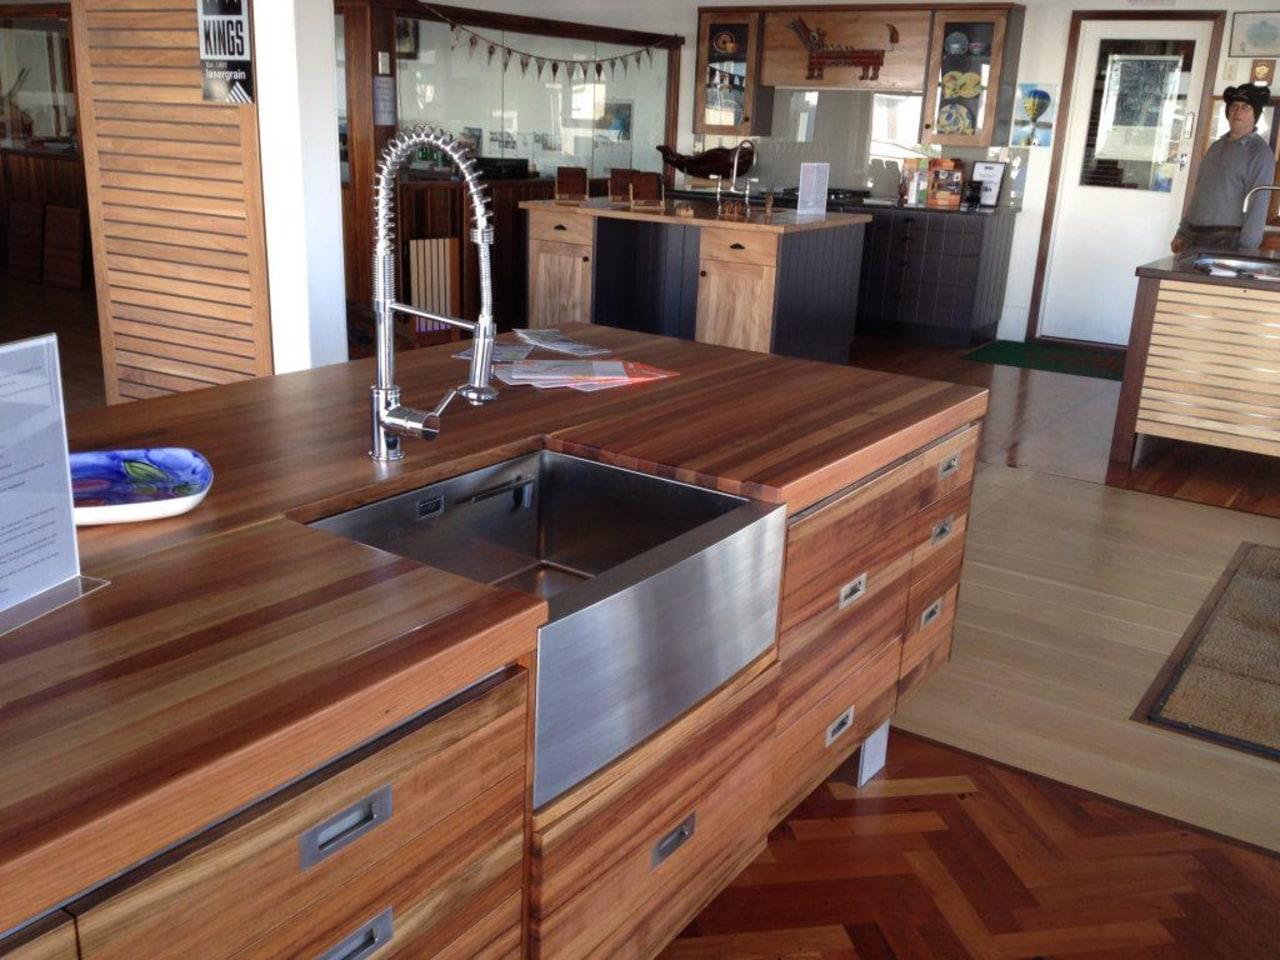 Sink: Kings Fourth Generation 2 ArgonSee this cabinetry, countertop, cuisine classique, floor, flooring, furniture, hardwood, kitchen, laminate flooring, wood, wood flooring, wood stain, brown